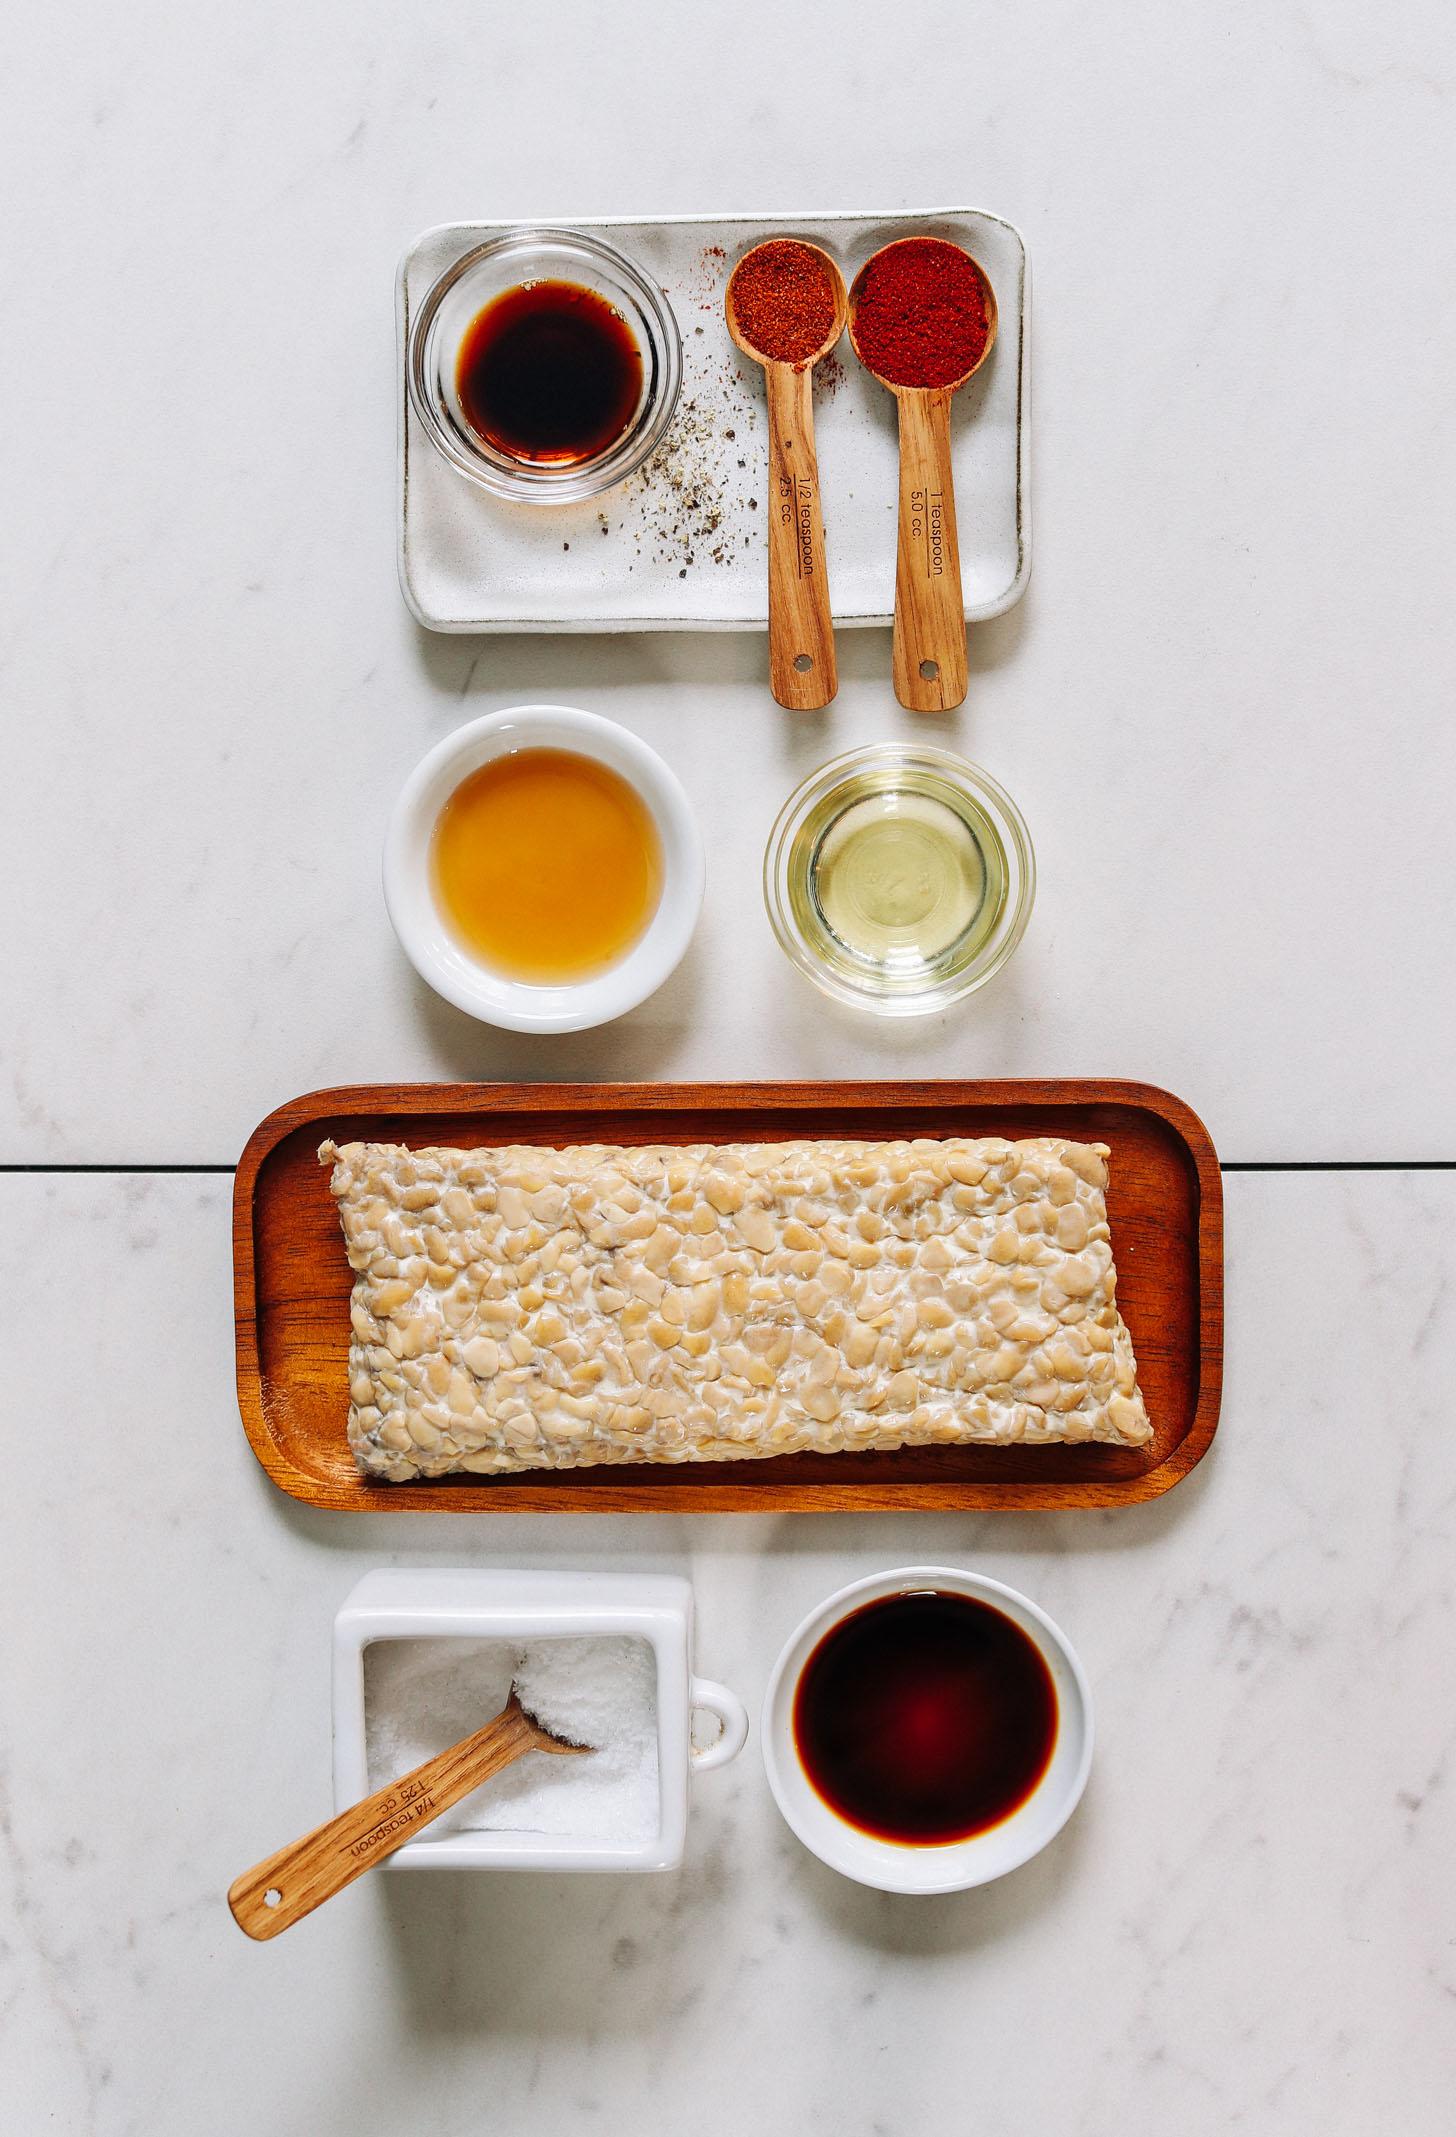 Tamari, cayenne, smoked paprika, maple syrup, avocado oil, tempeh, salt, and liquid smoke